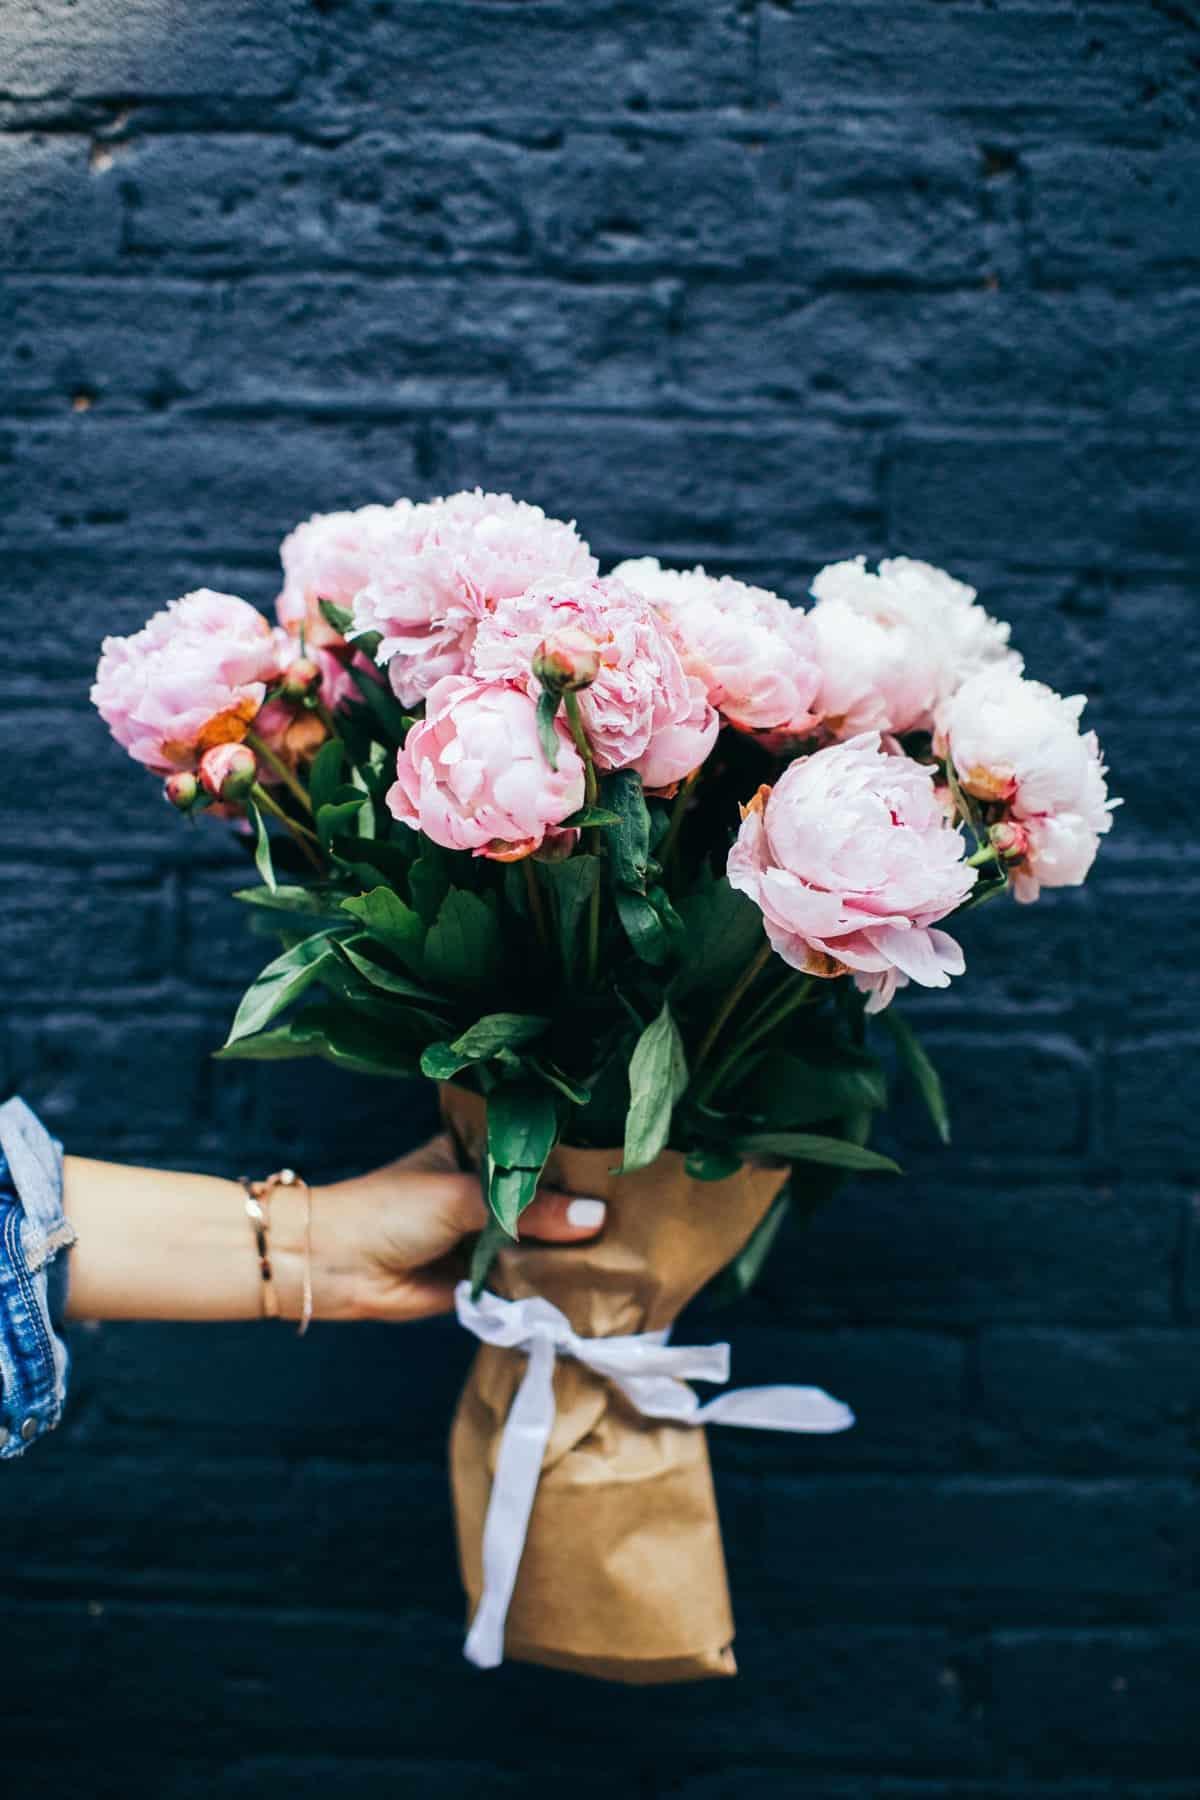 Pink Peonies, summer outfit ideas, white dress ideas - My Style Vita @mystylevita - 33